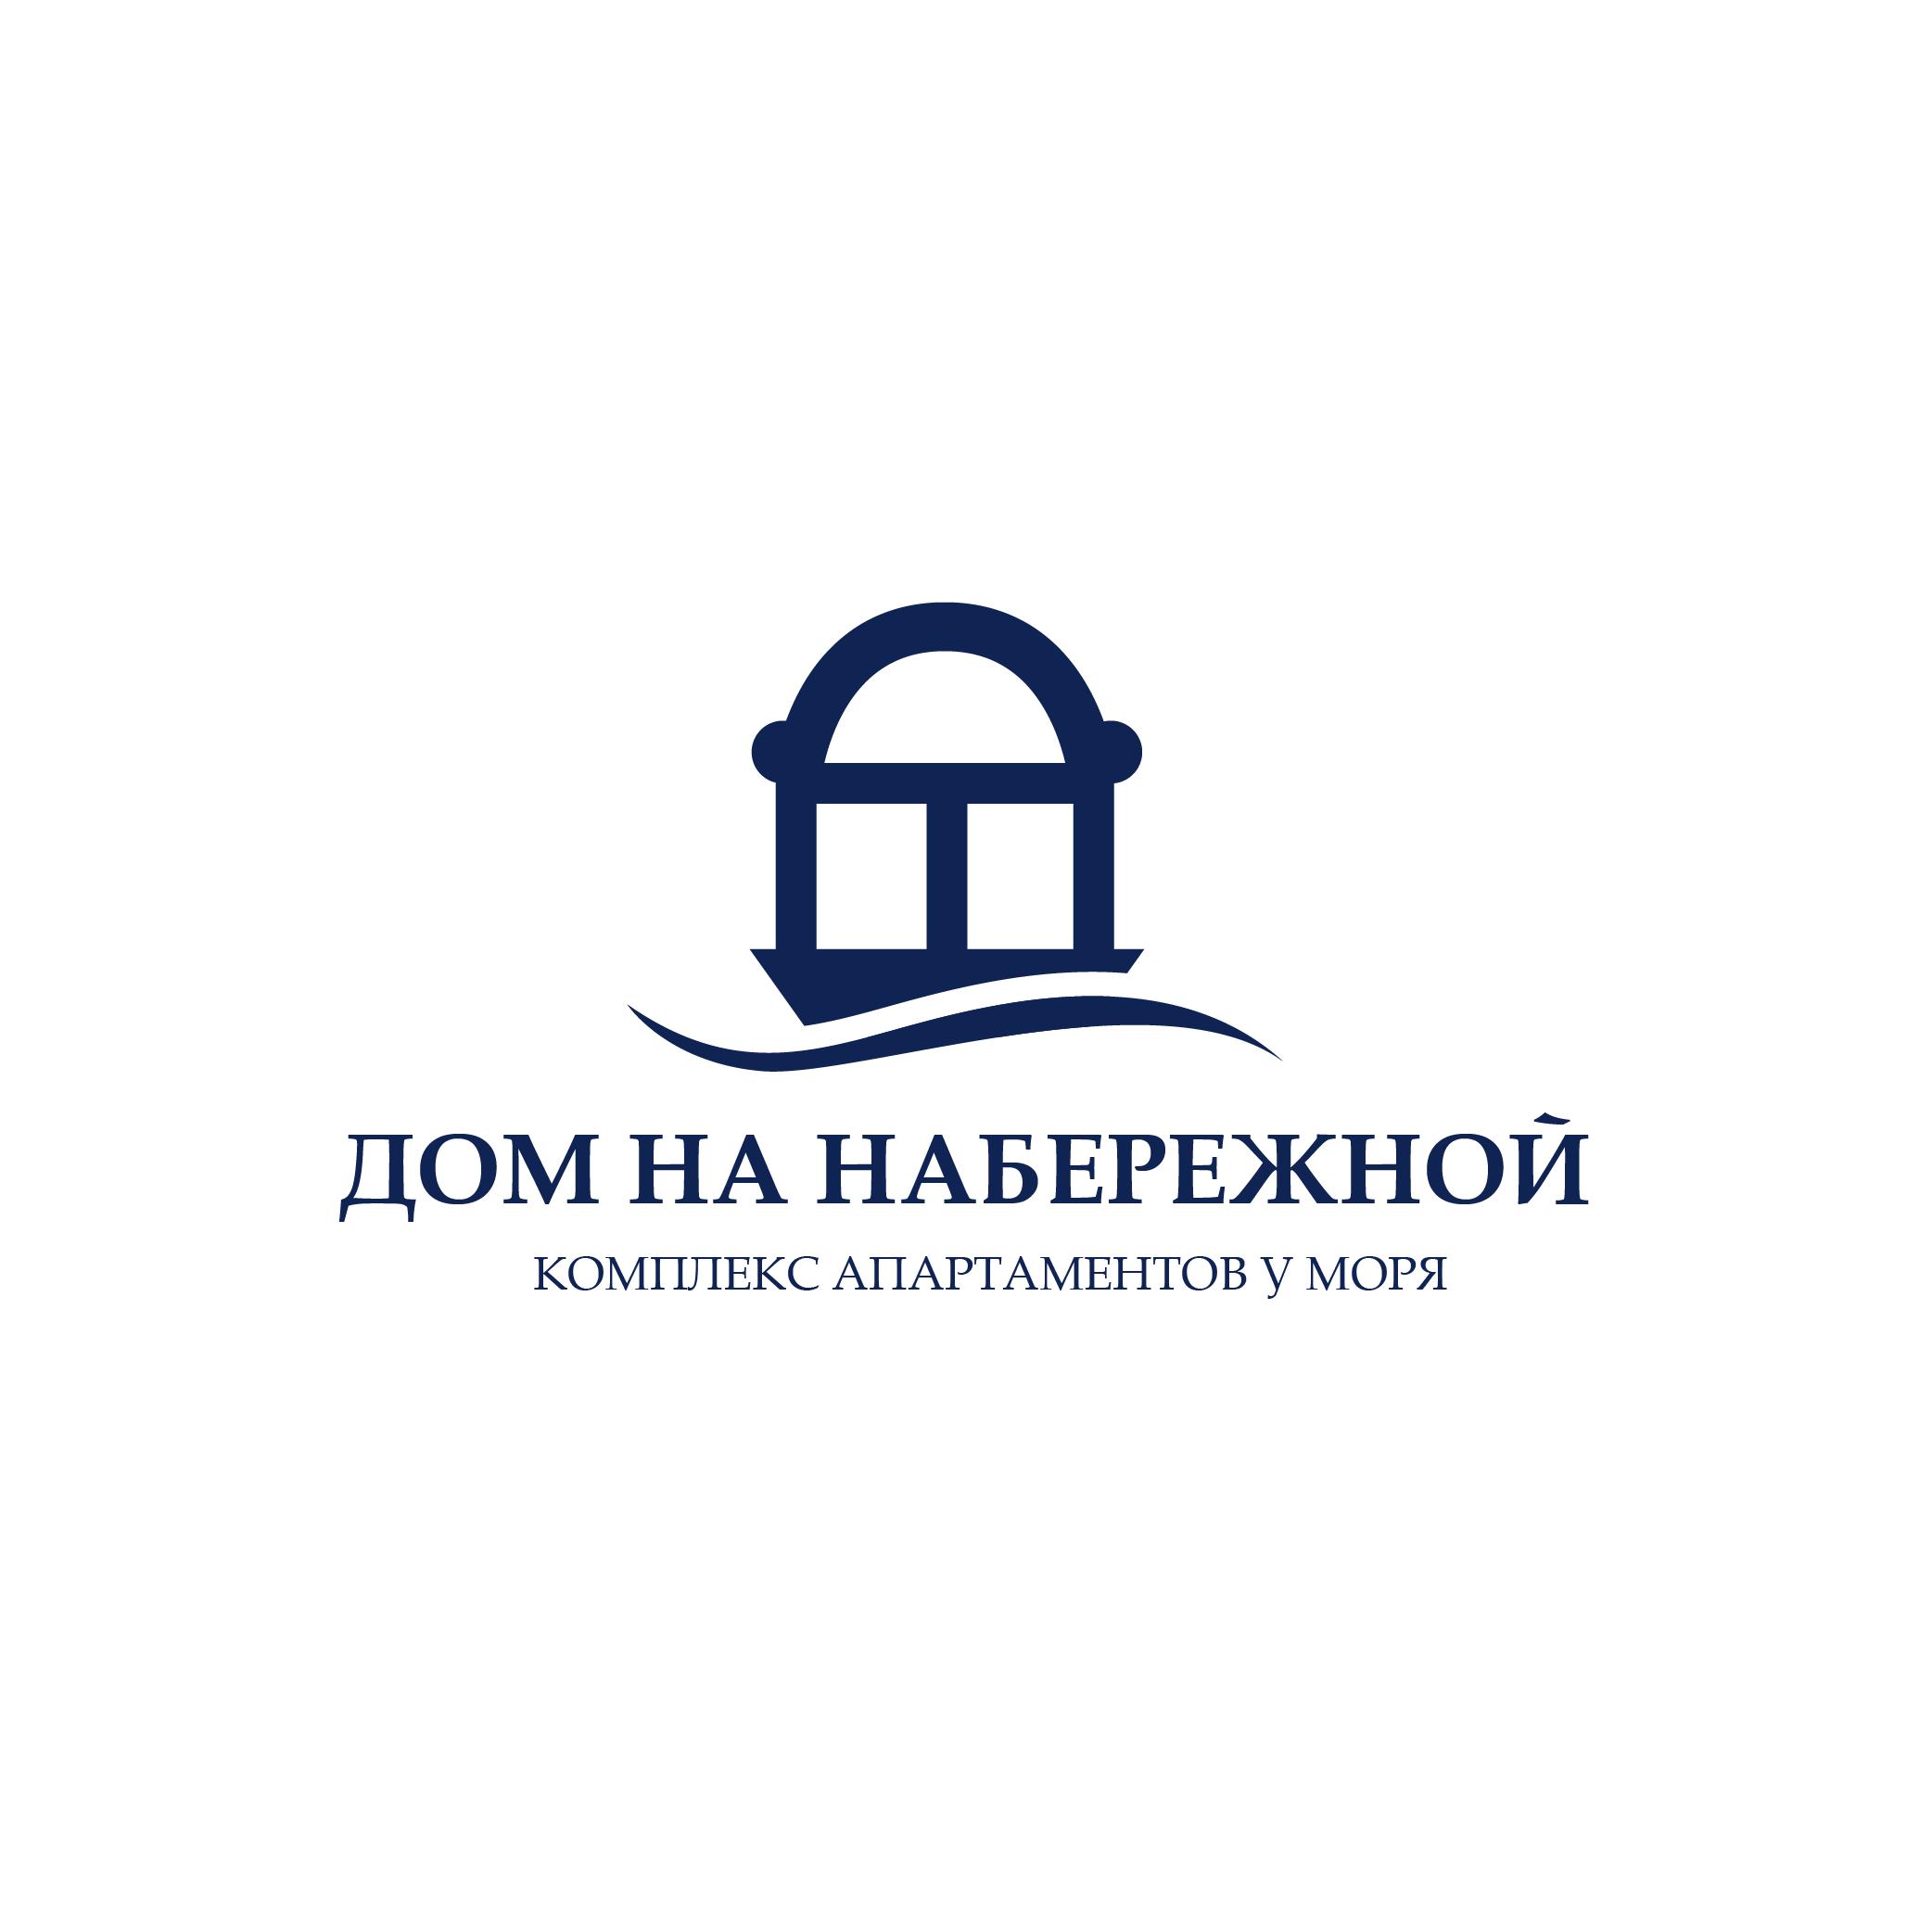 РАЗРАБОТКА логотипа для ЖИЛОГО КОМПЛЕКСА премиум В АНАПЕ.  фото f_7105de7cc72272e3.png